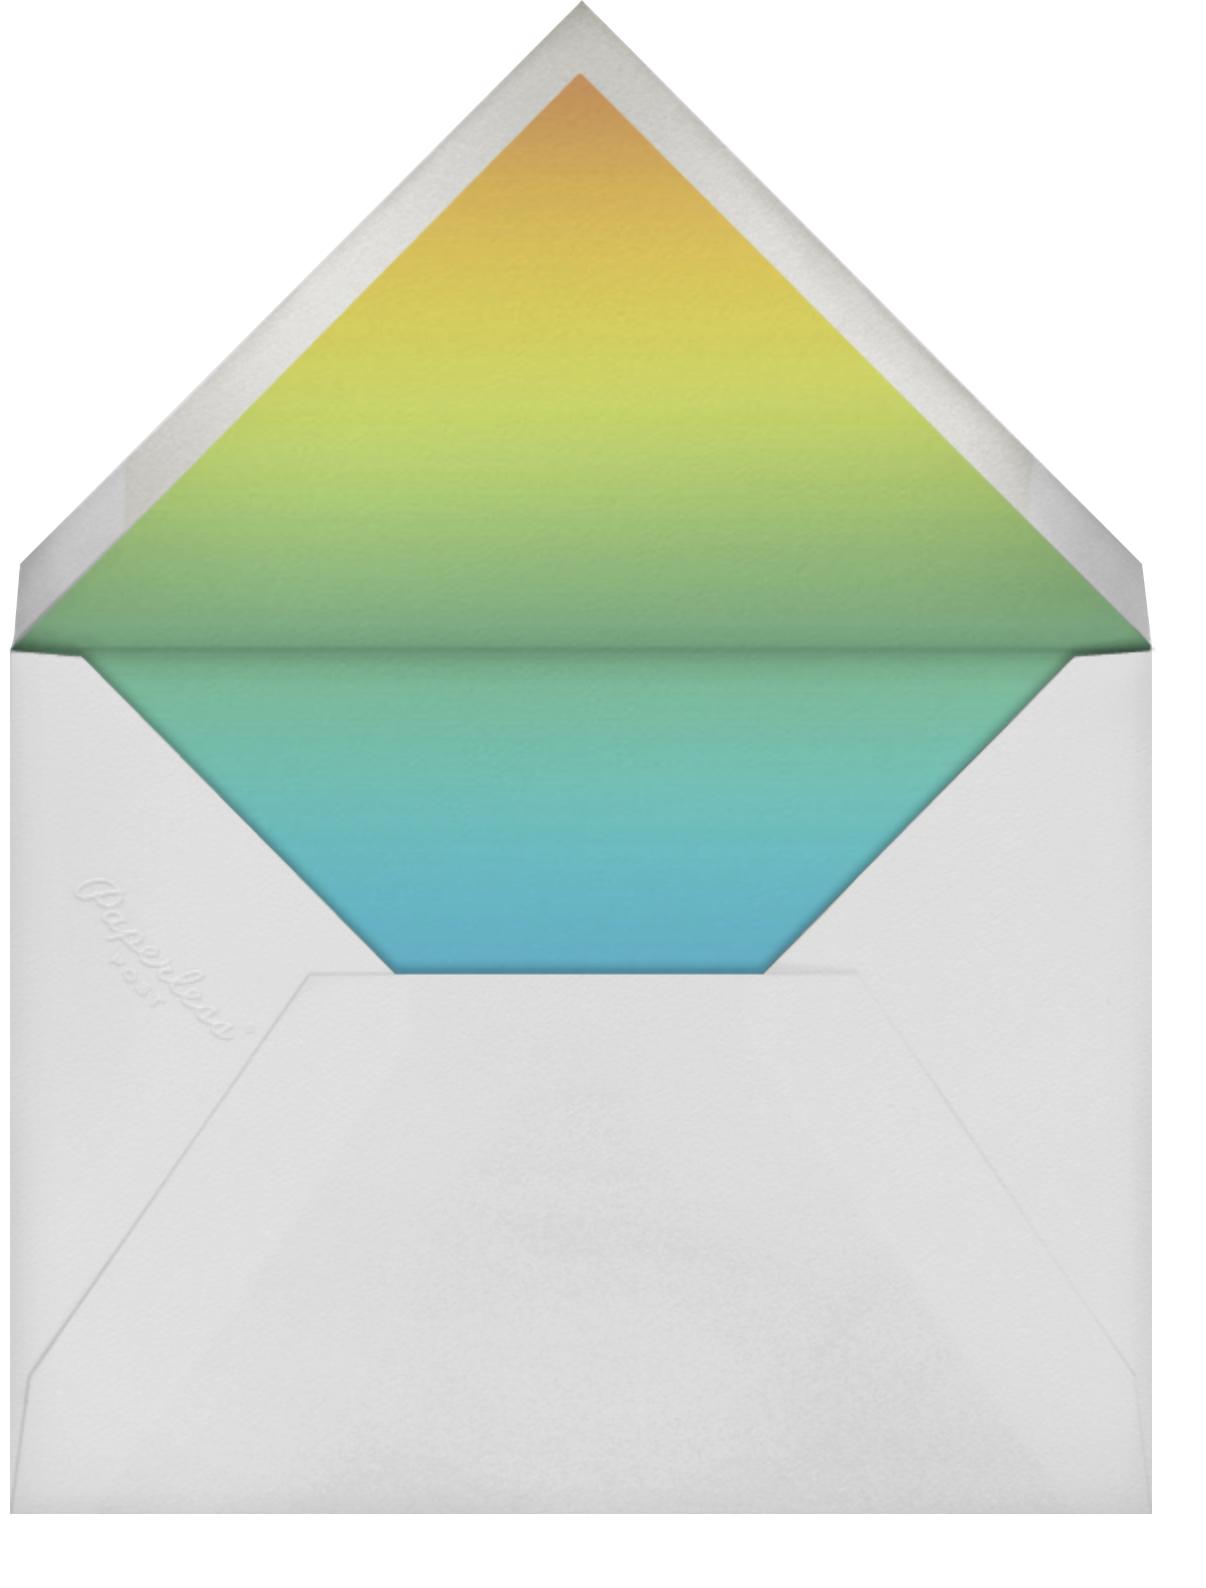 Three Photo Stripes - Paperless Post - Envelope